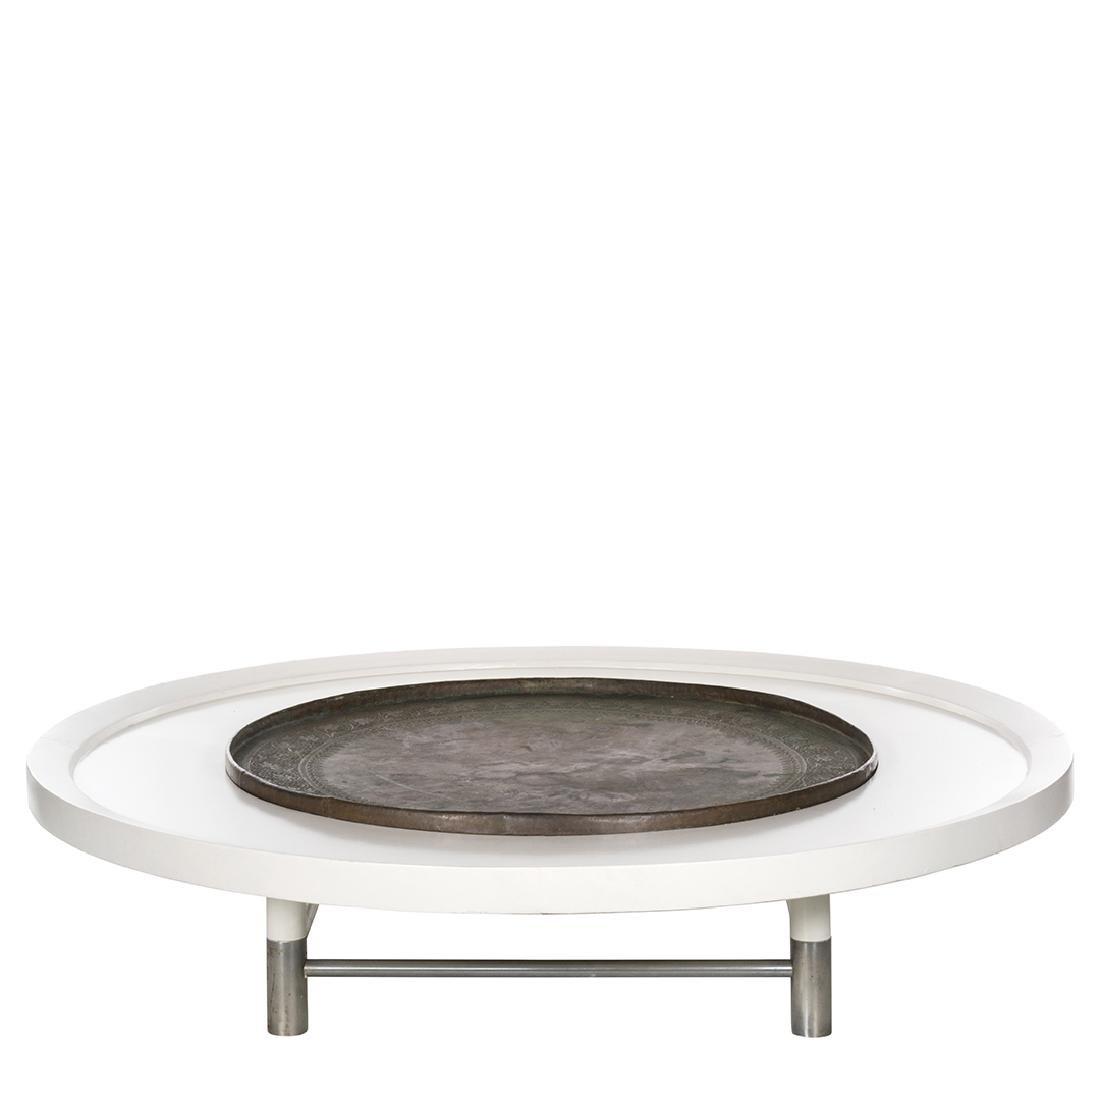 Arthur Elrod Monumental Custom Coffee Table